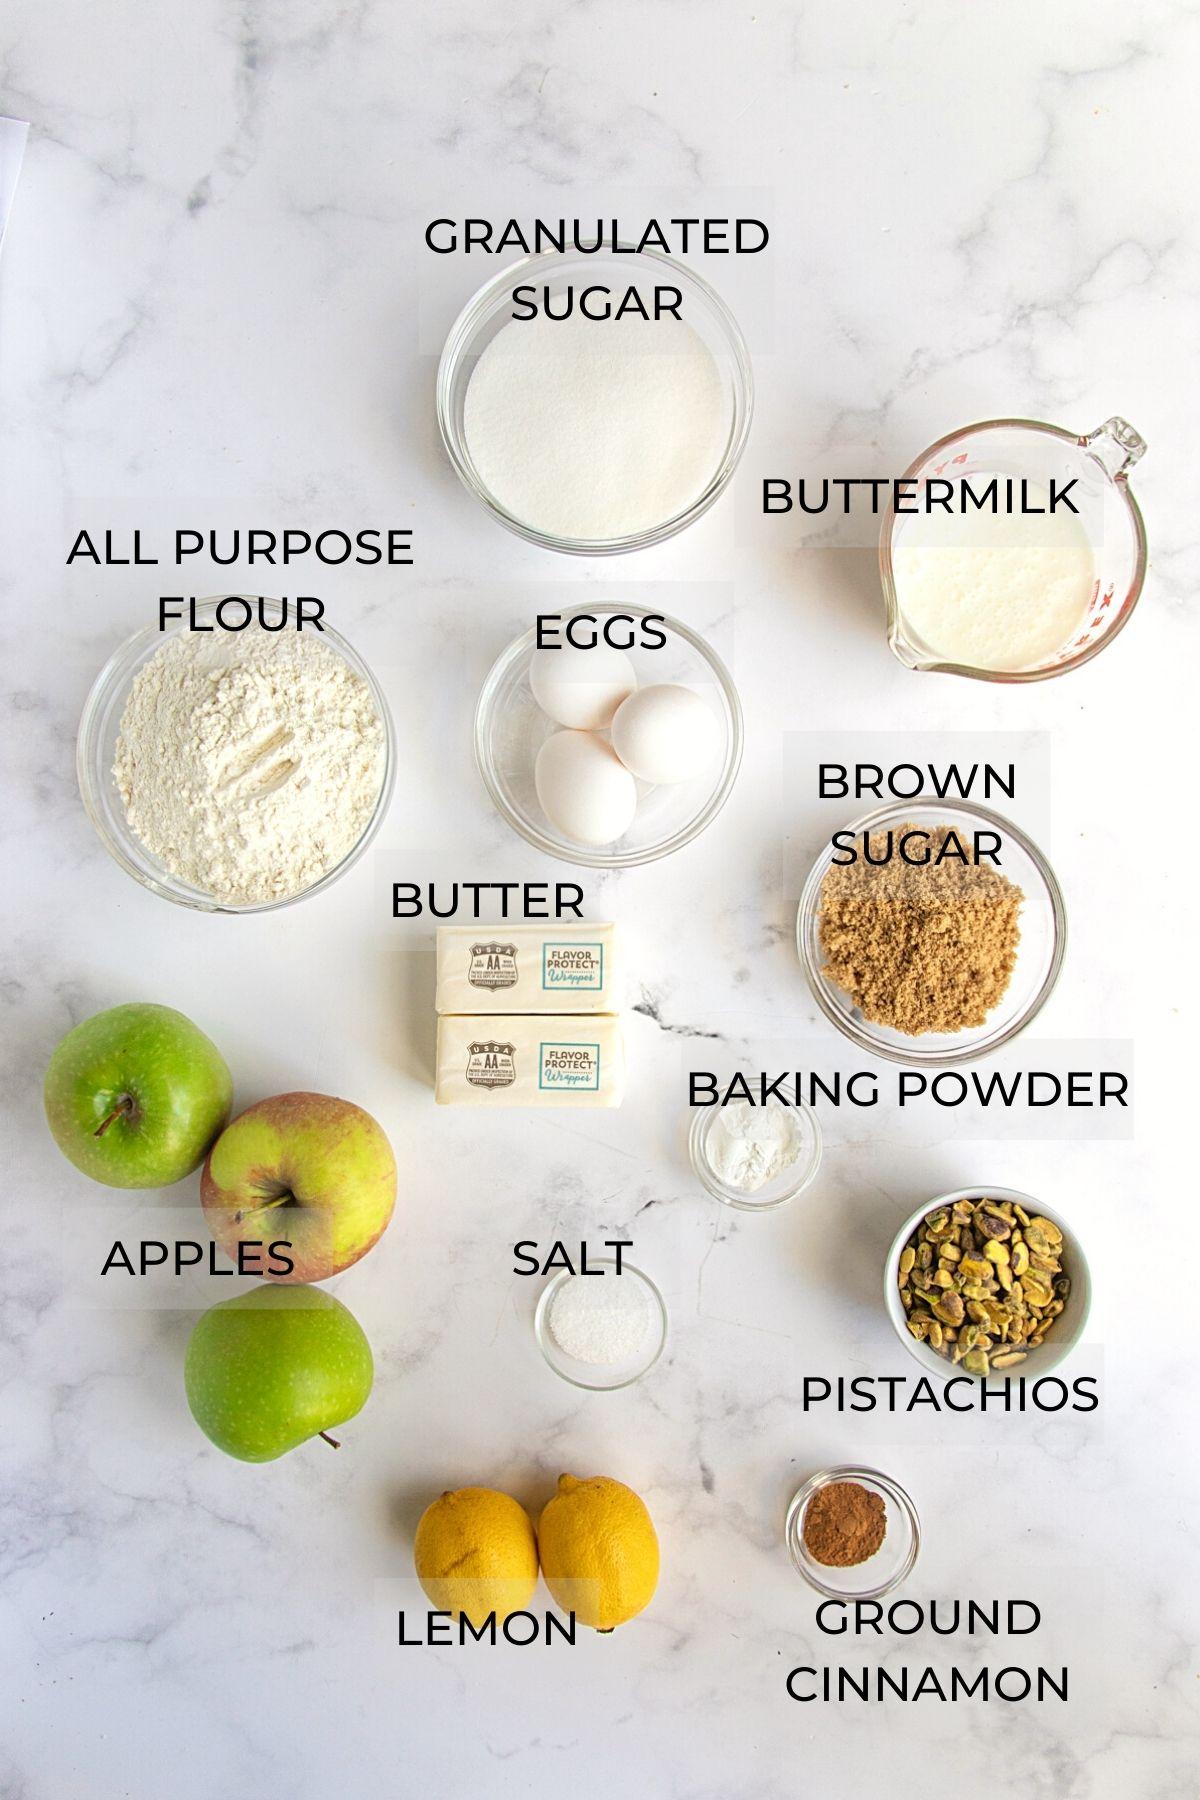 Apple Cake Ingredients - White sugar, buttermilk, brown sugar, baking powder, pistachios, ground cinnamon, lemons, apples, salt. butter, eggs, all-purpose flour